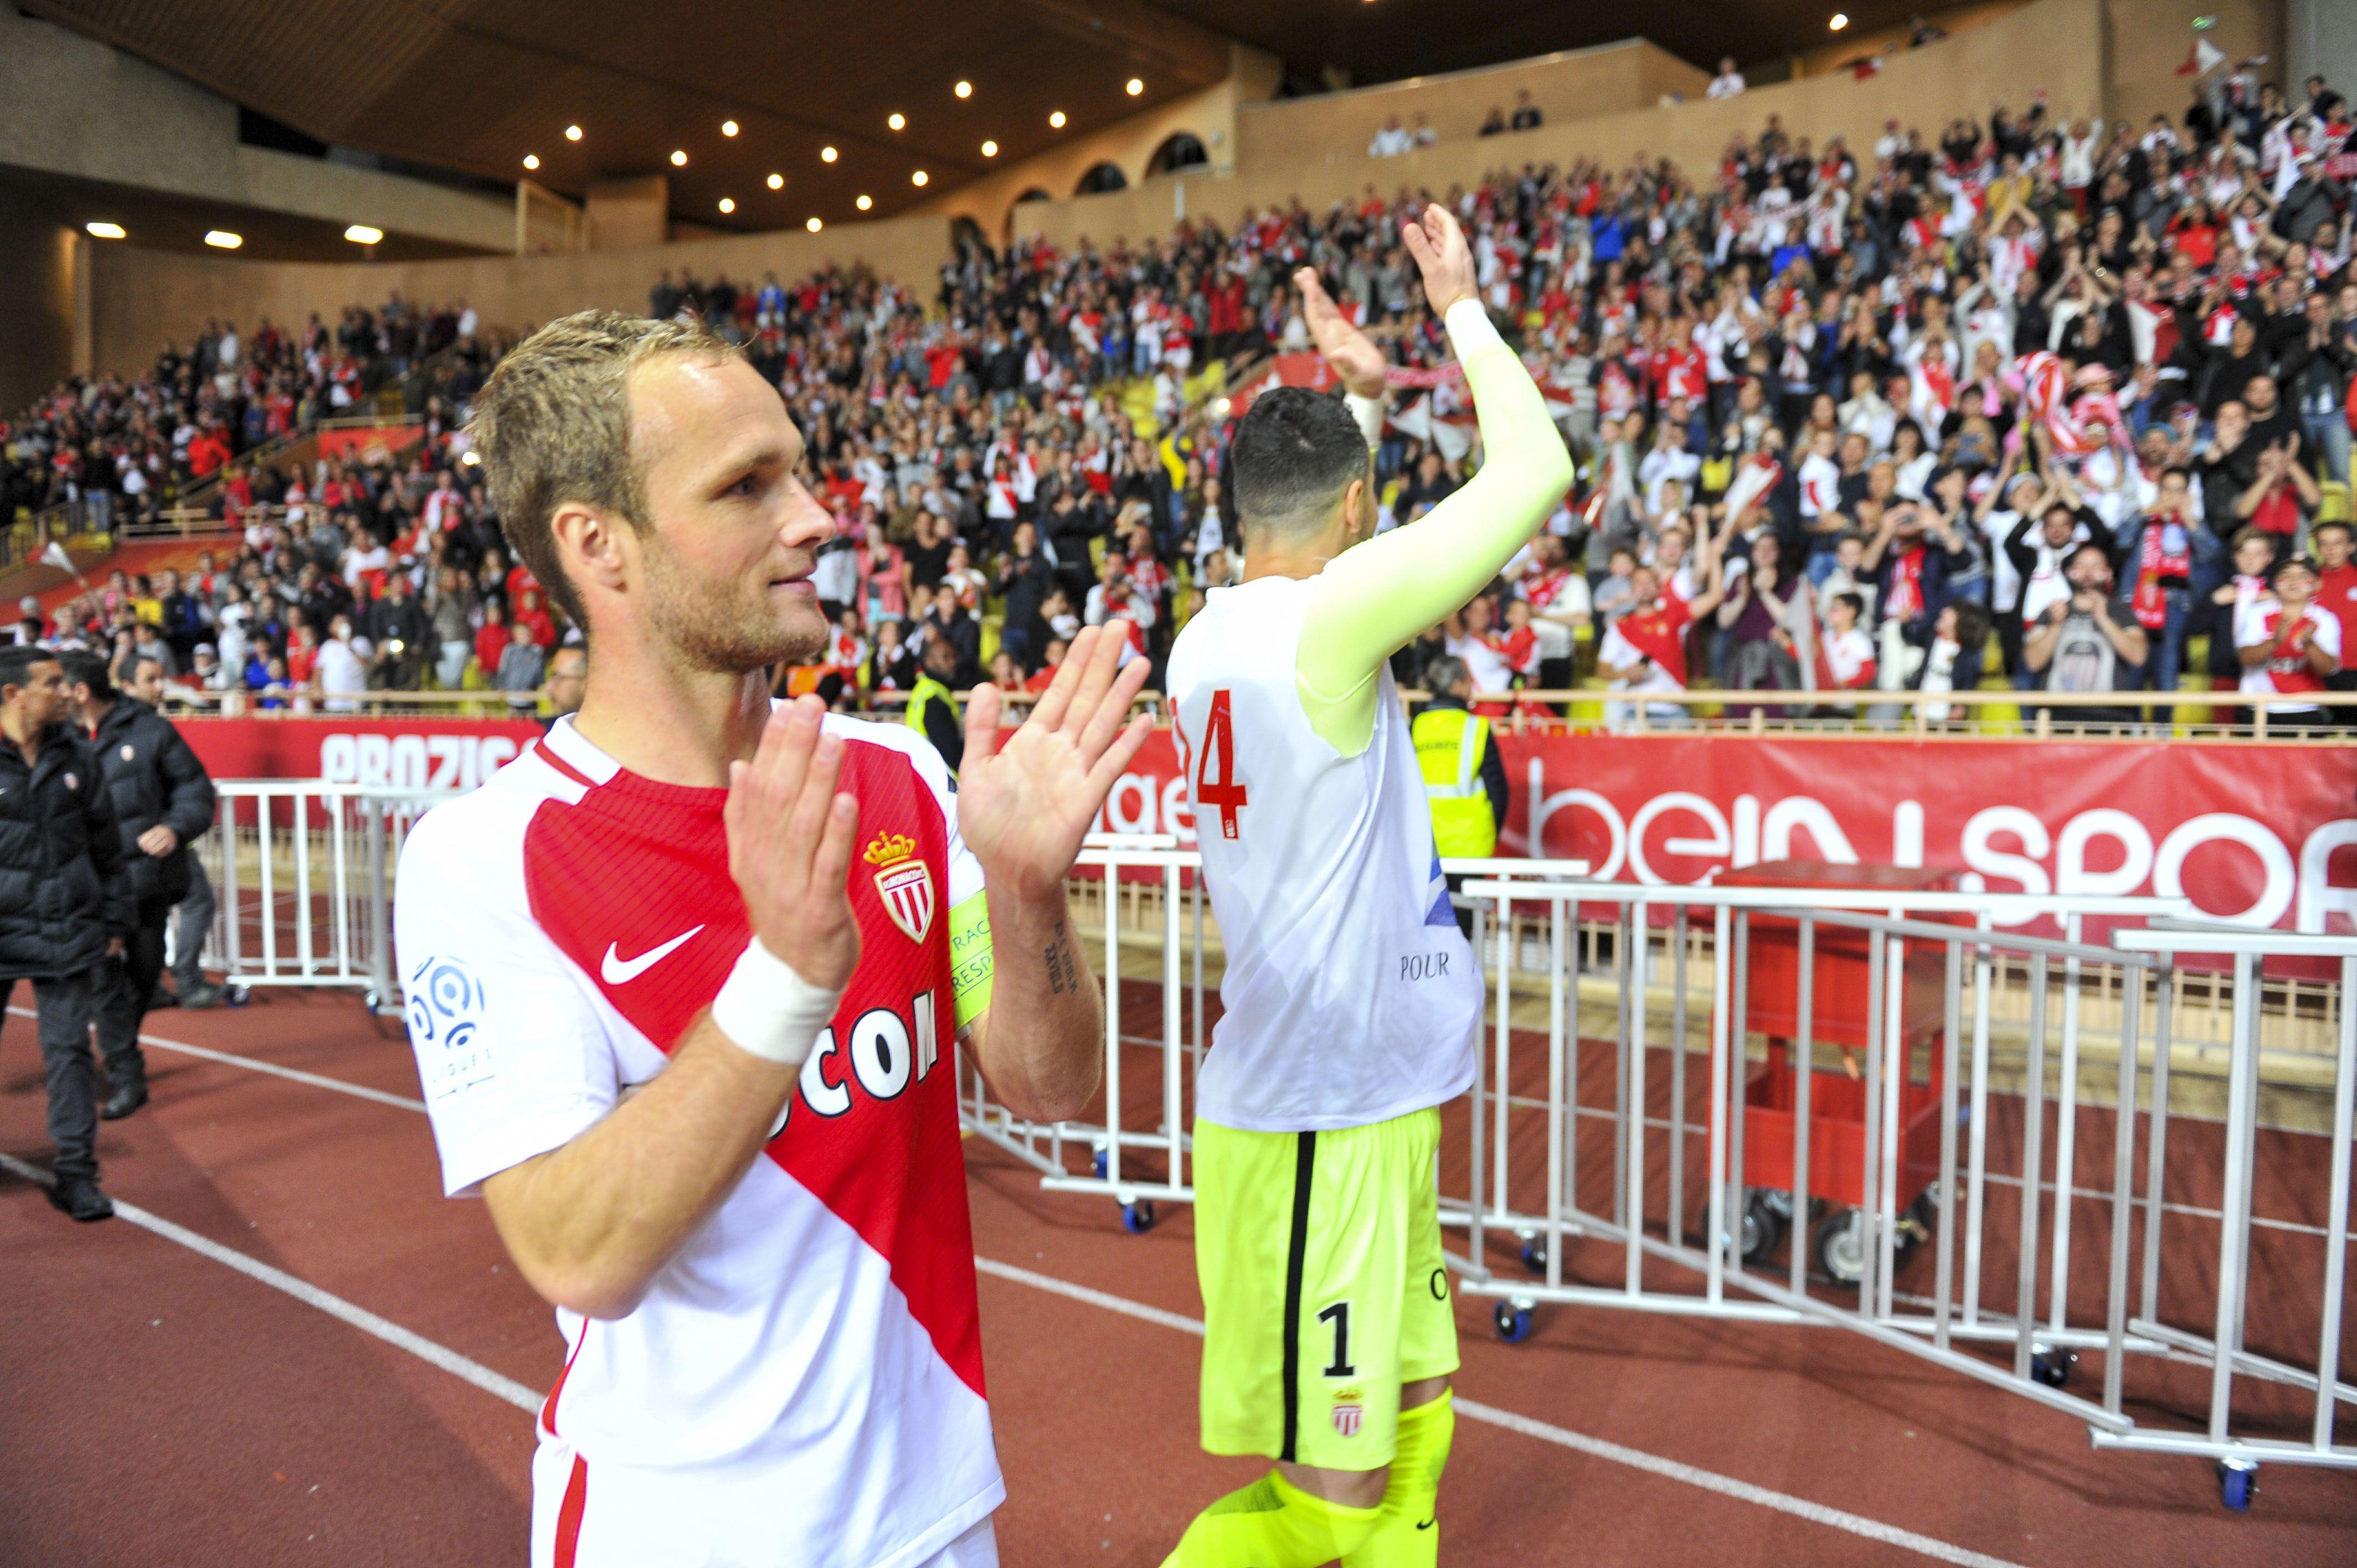 Football - Transferts - Valère Germain, première recrue estivale de l'OM